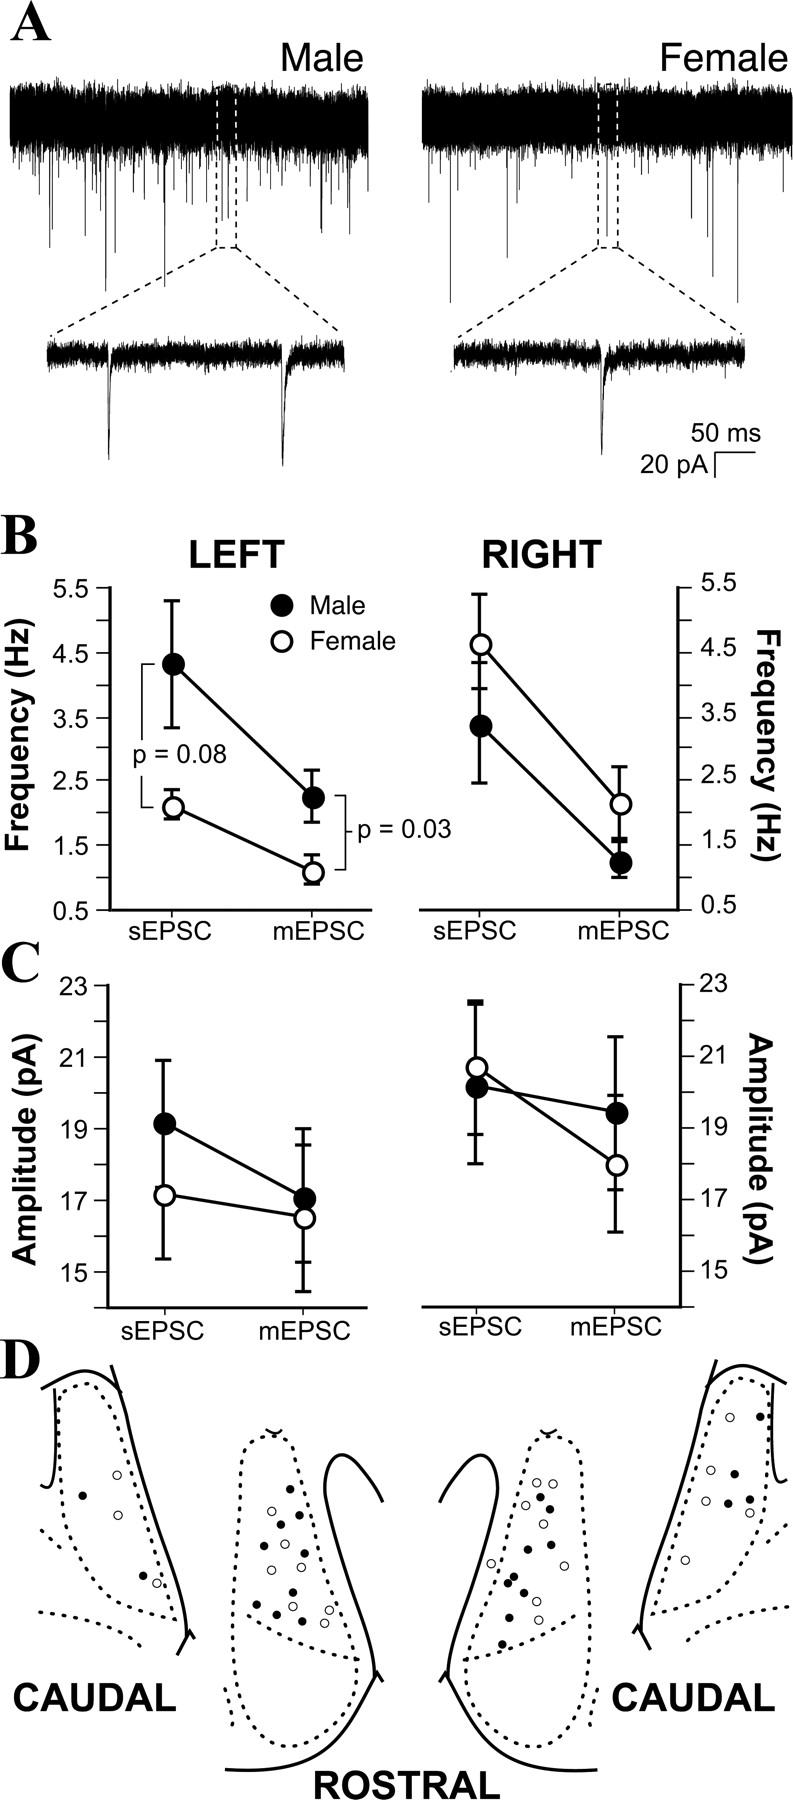 Optical reflexes determine sexuality